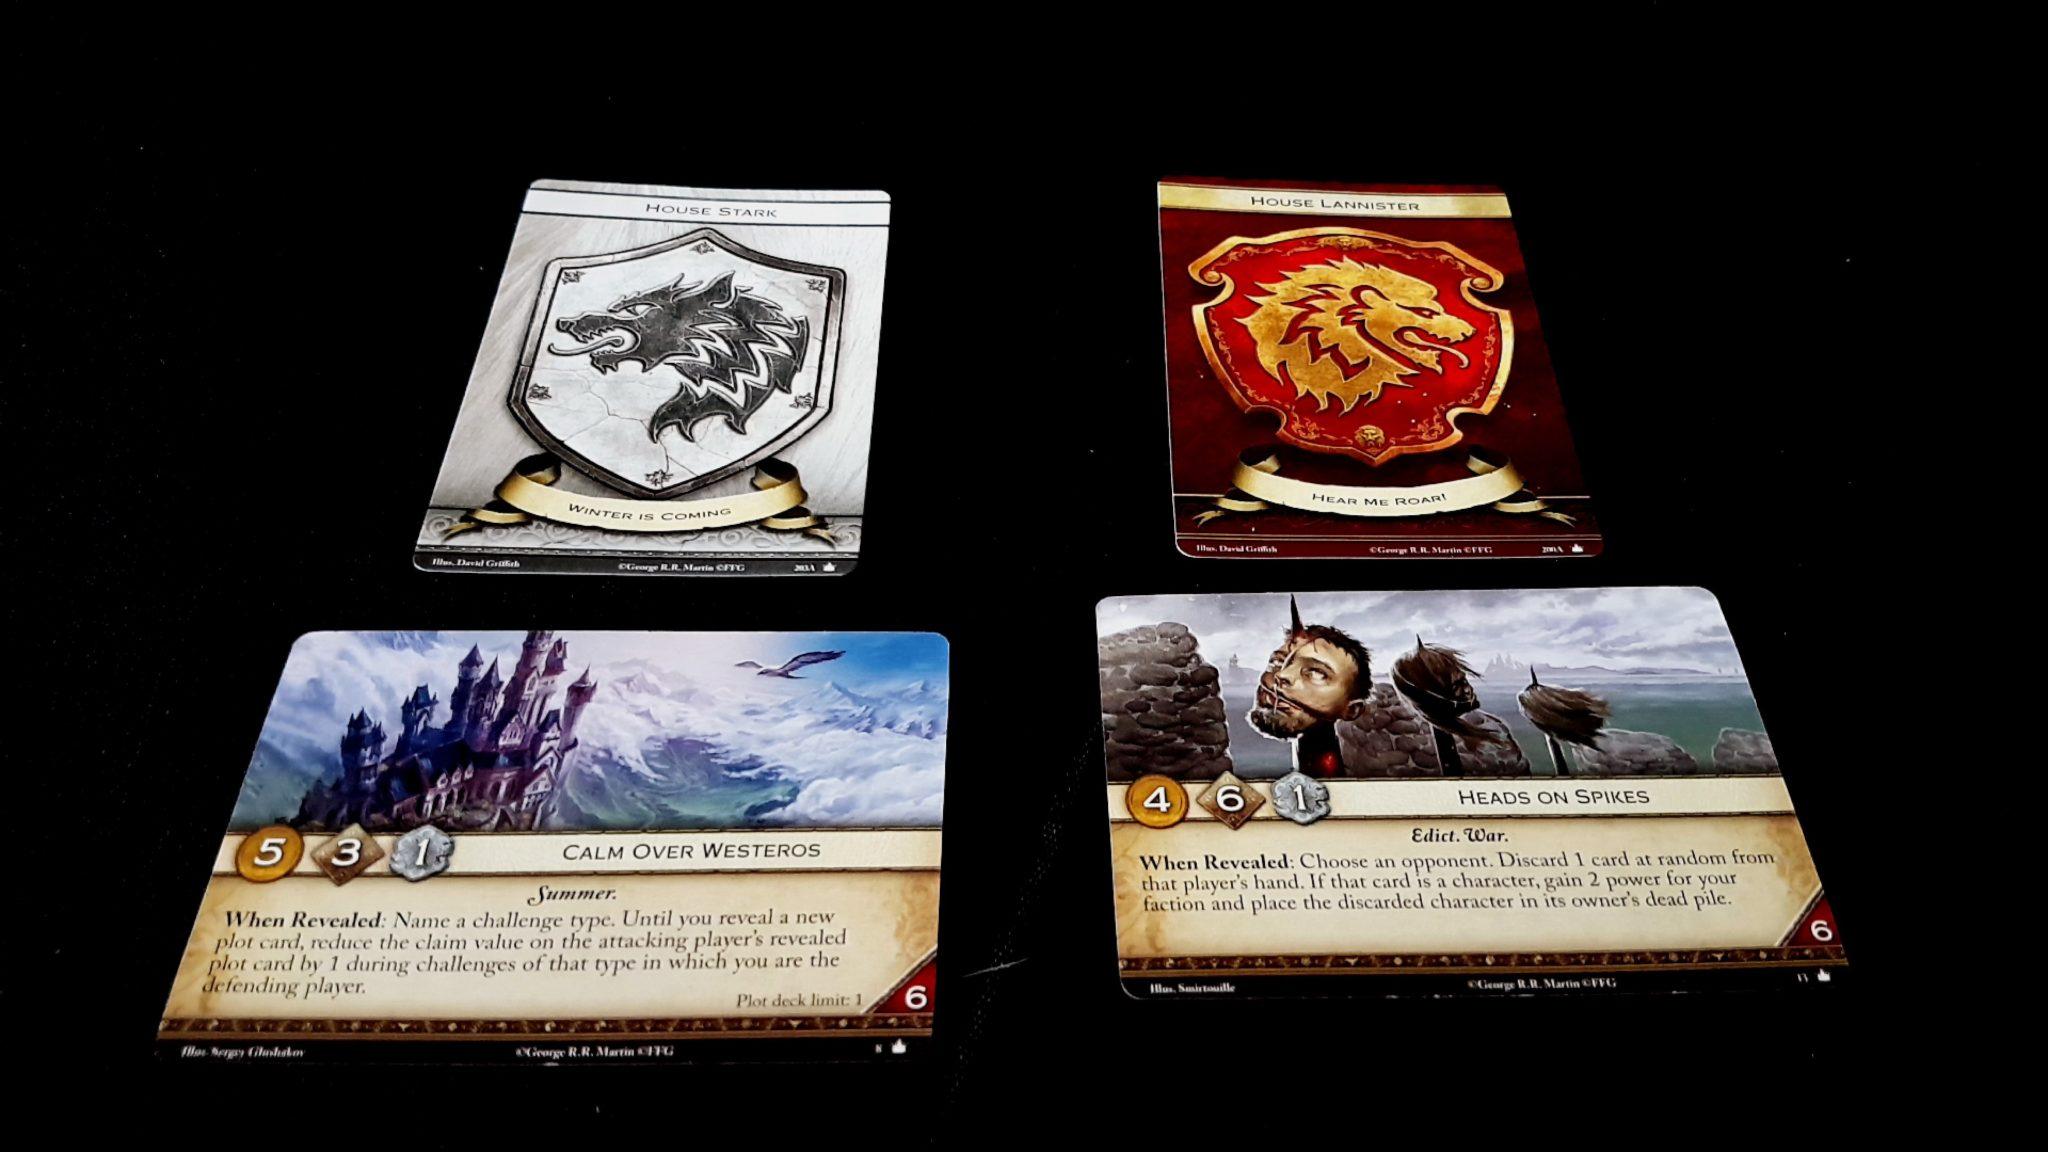 Revealed plot cards